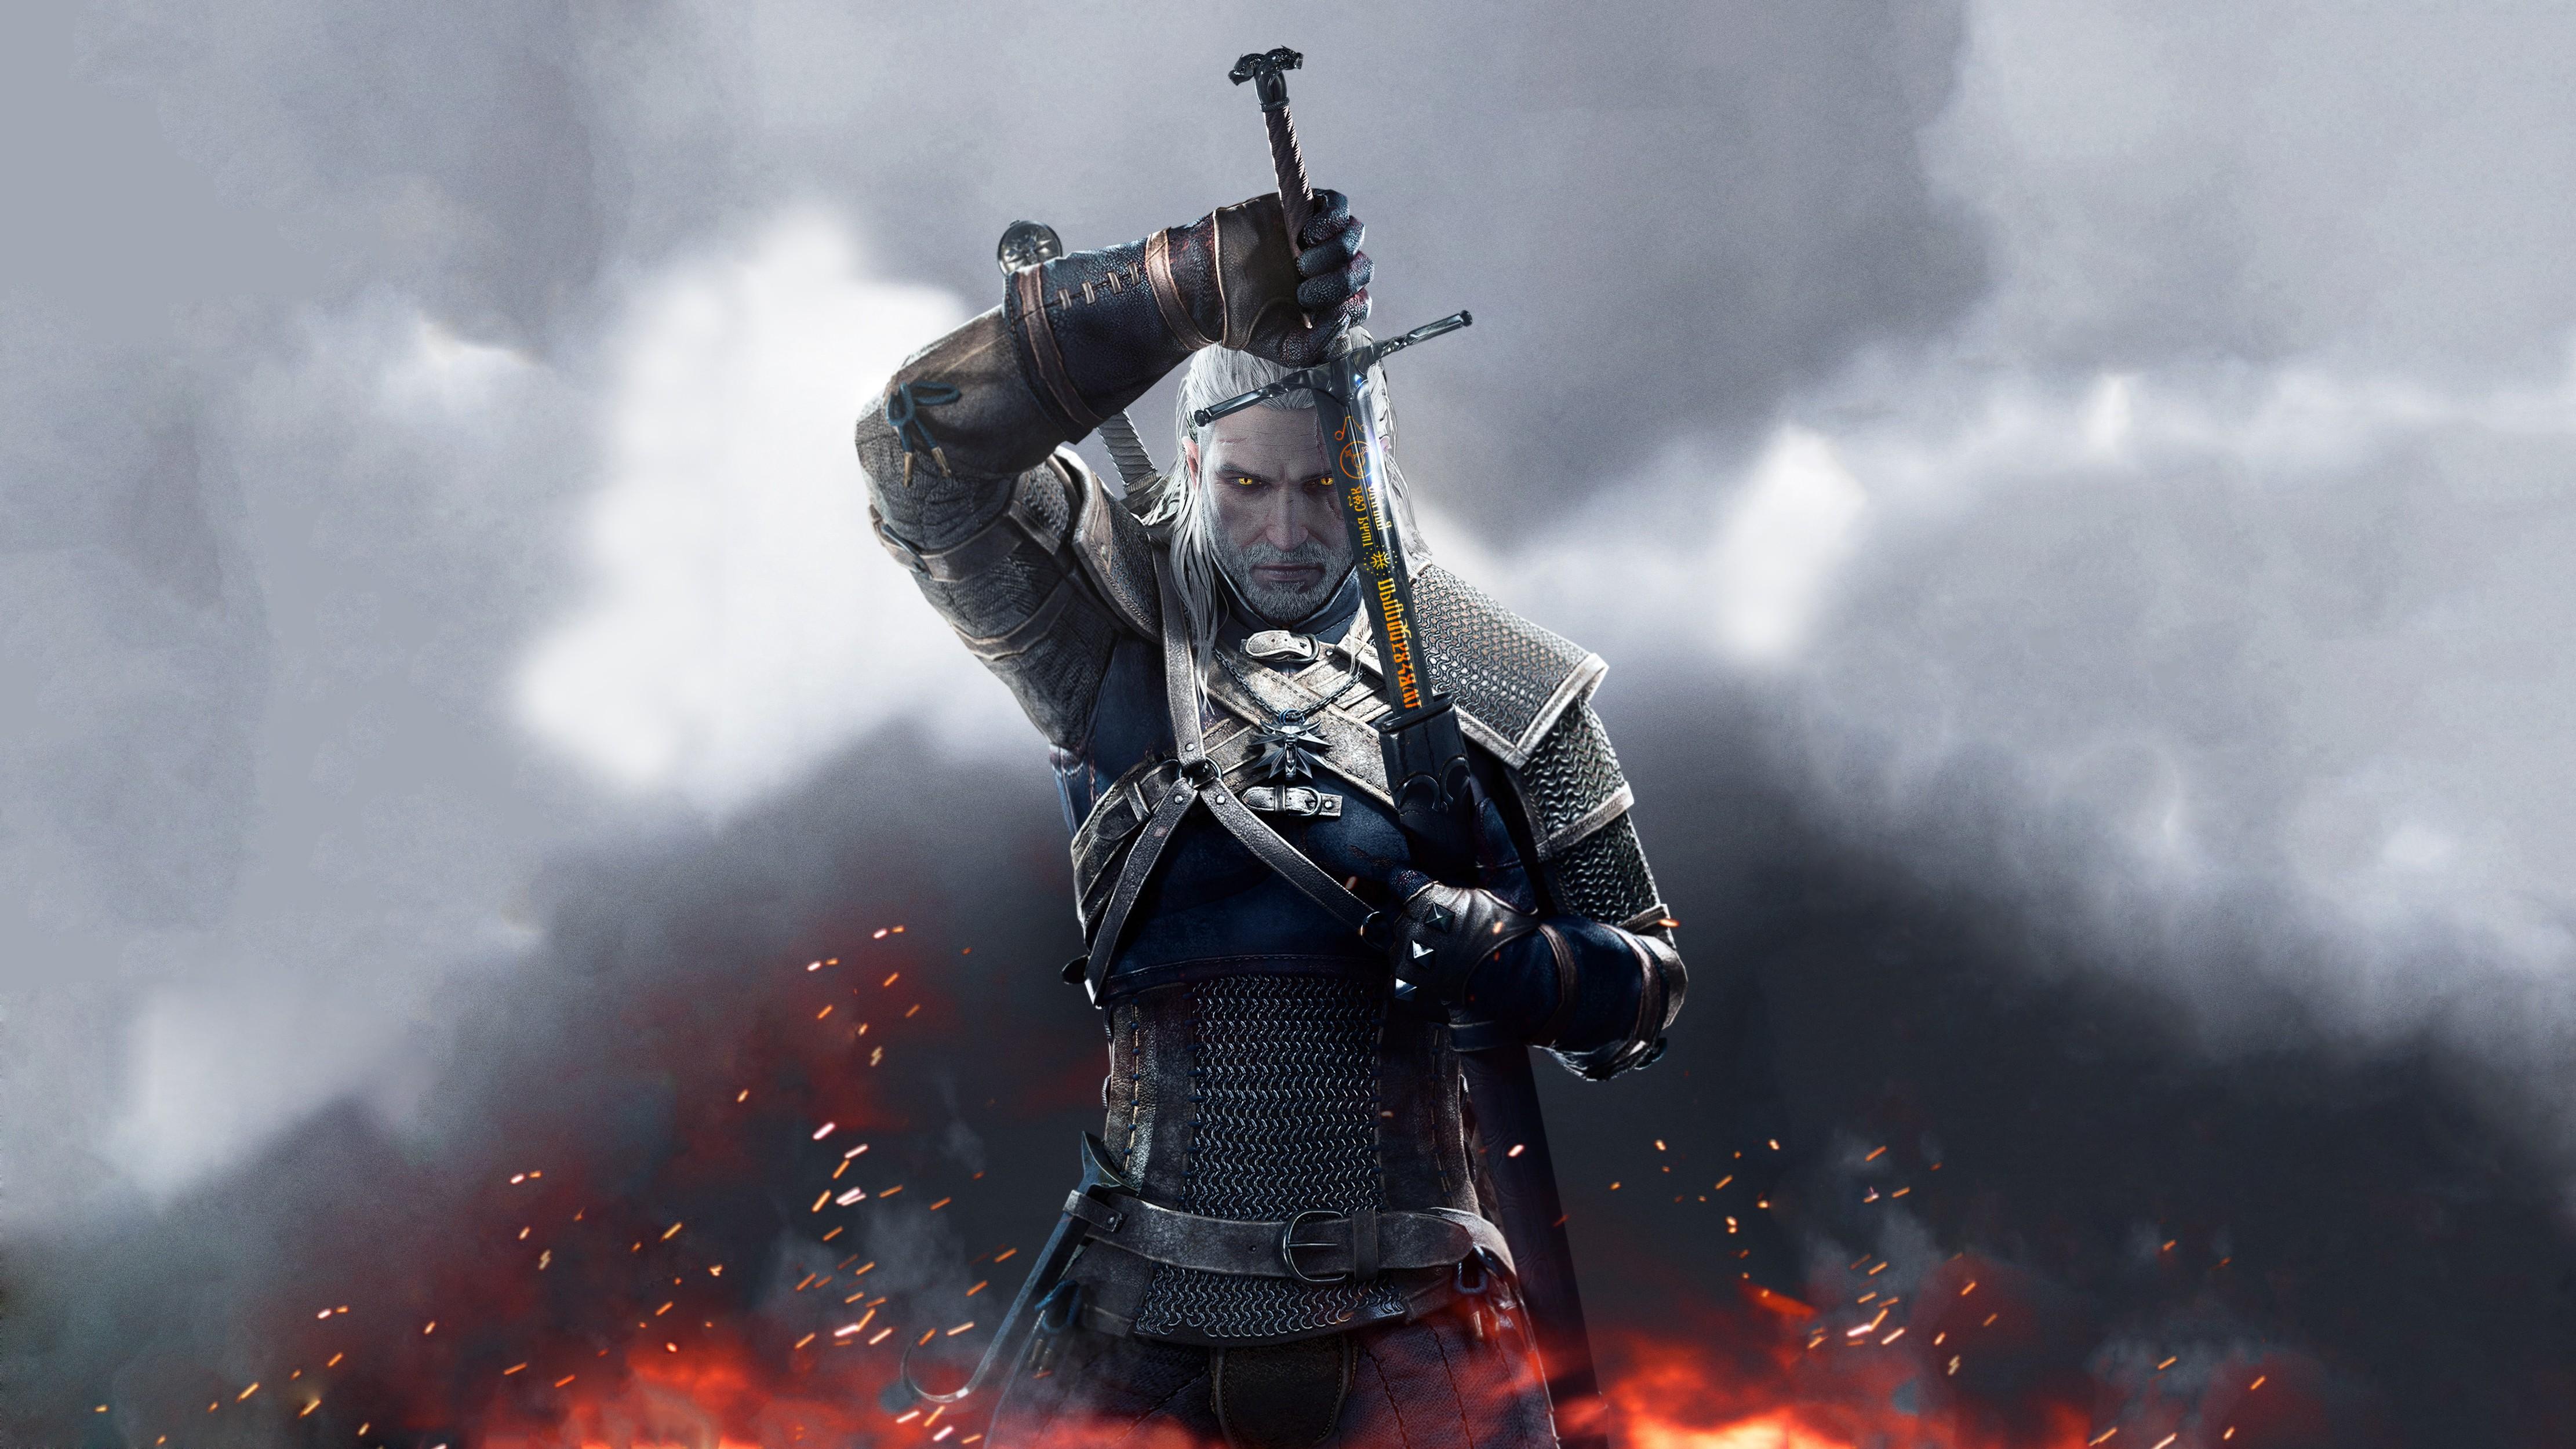 General 4444x2500 video games The Witcher 3: Wild Hunt Geralt of Rivia runes